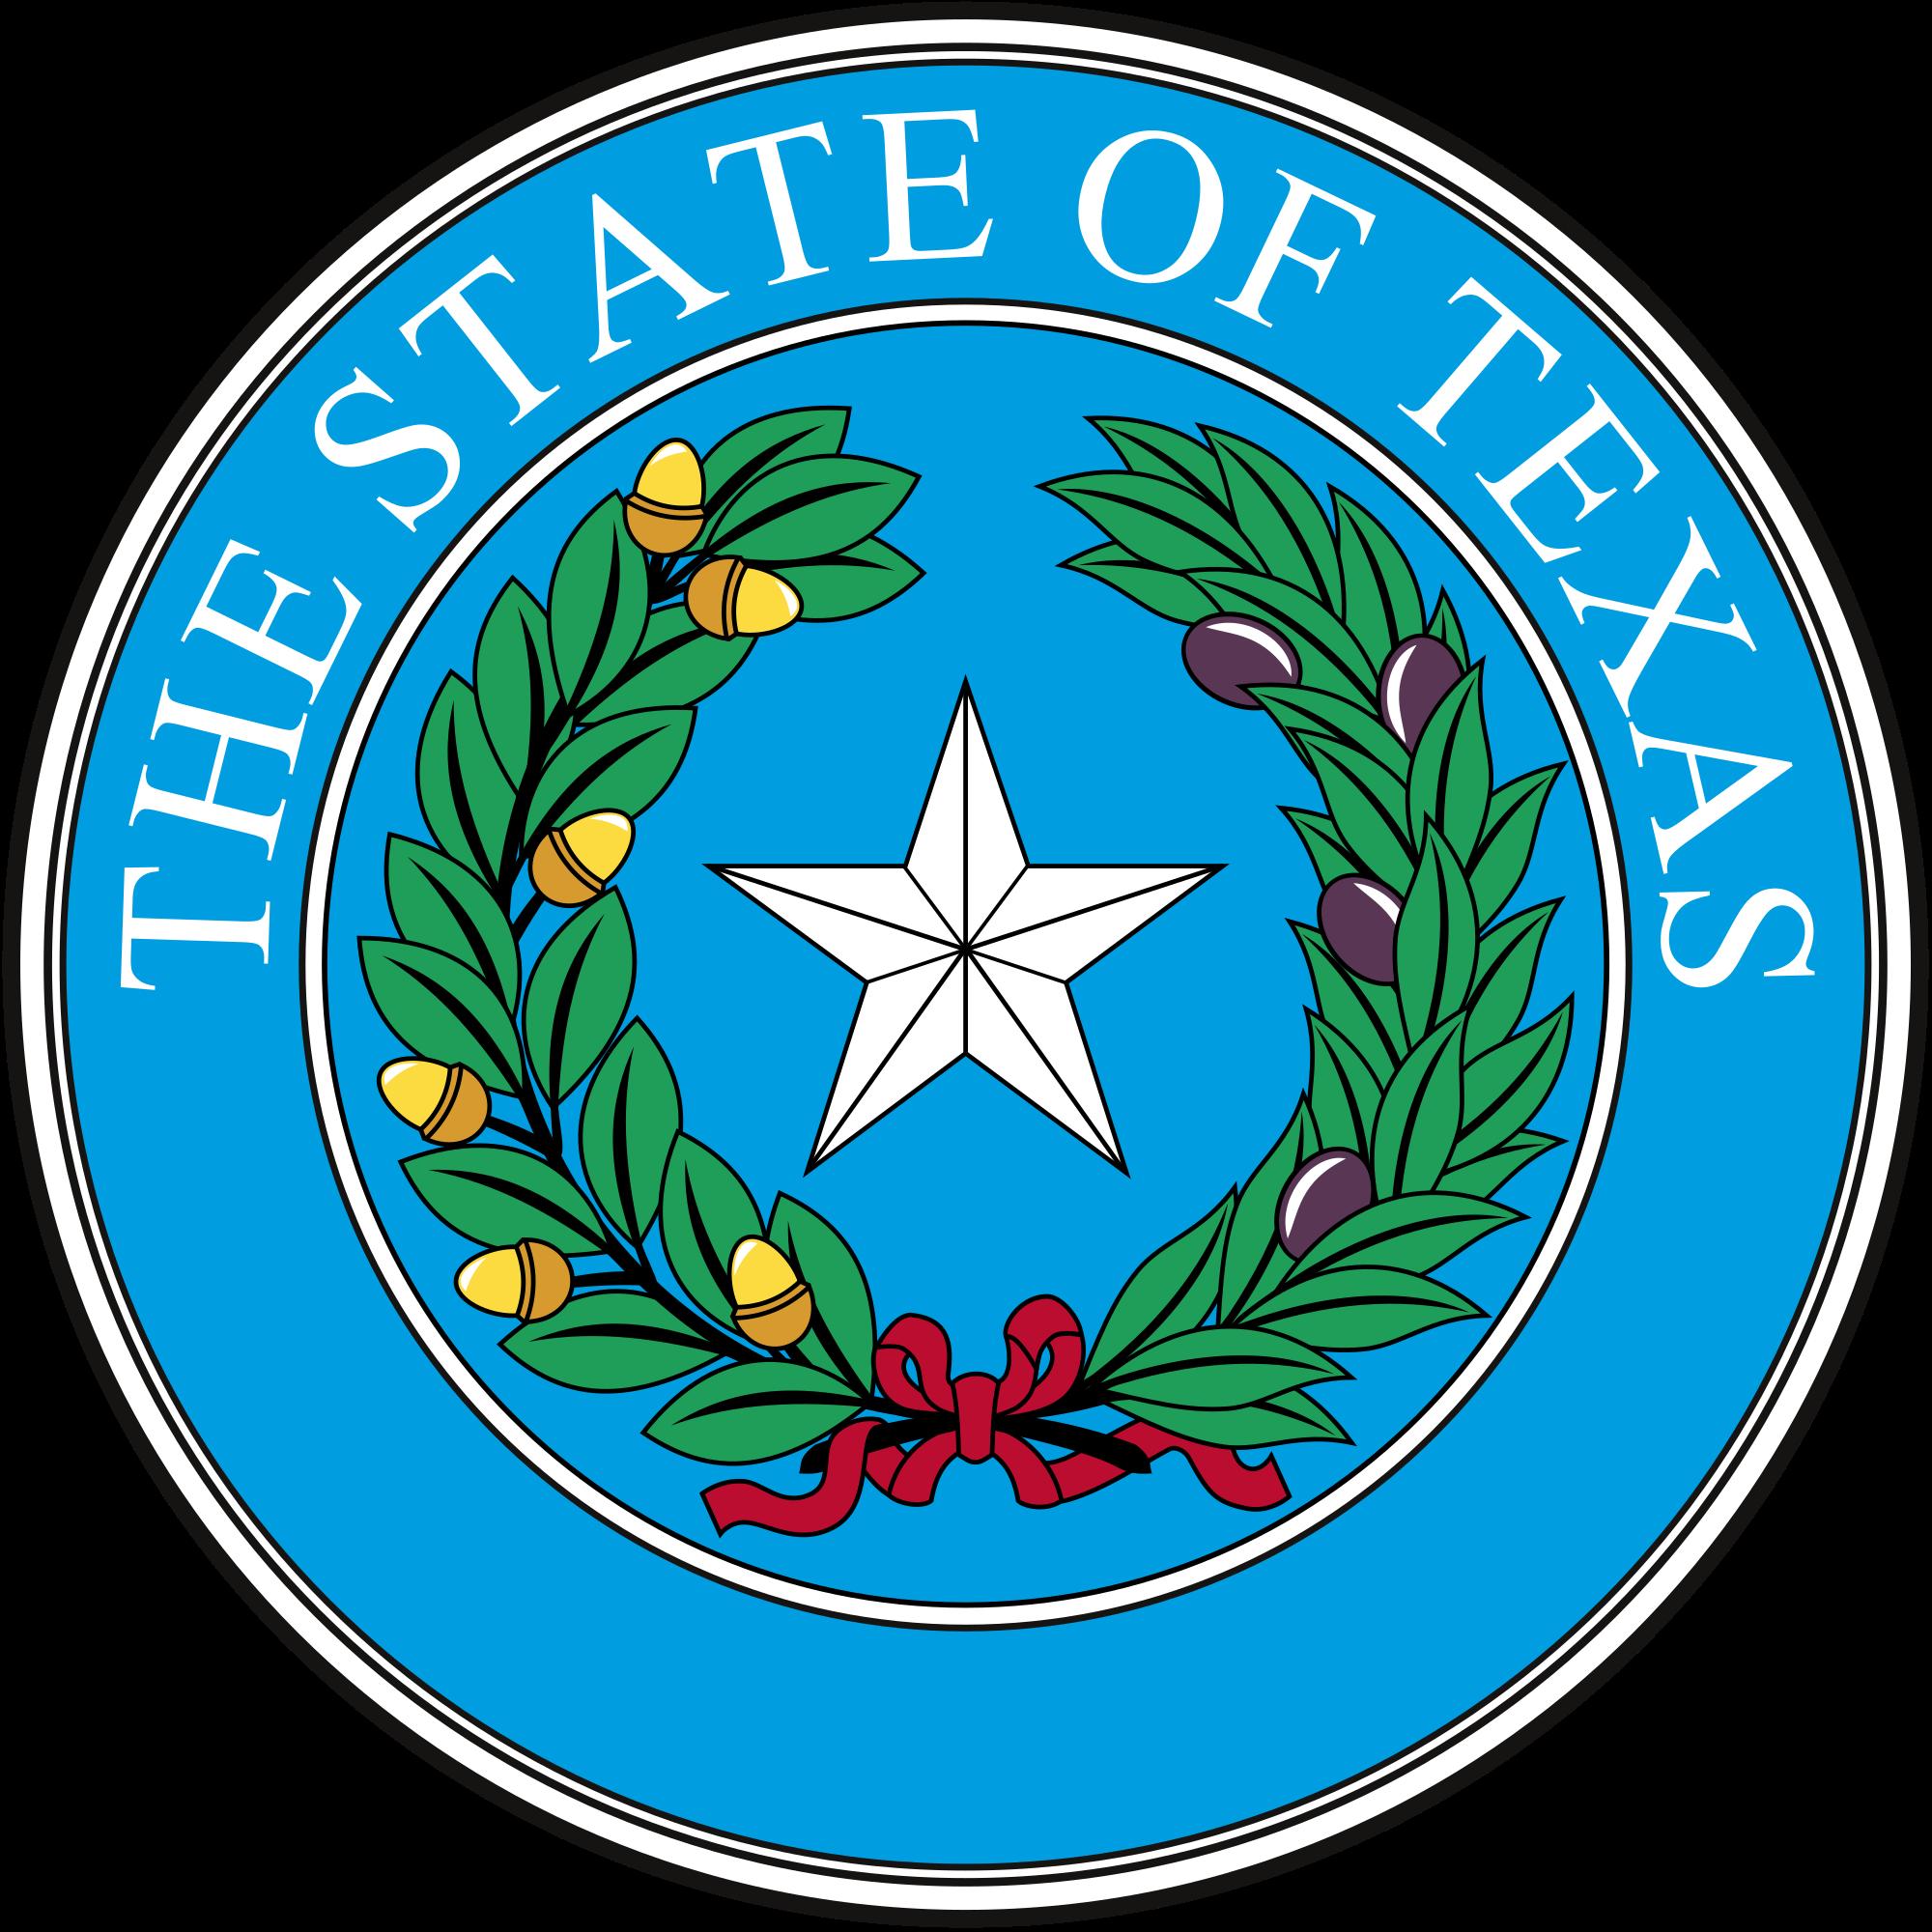 2000x2000 List Of Texas State Symbols